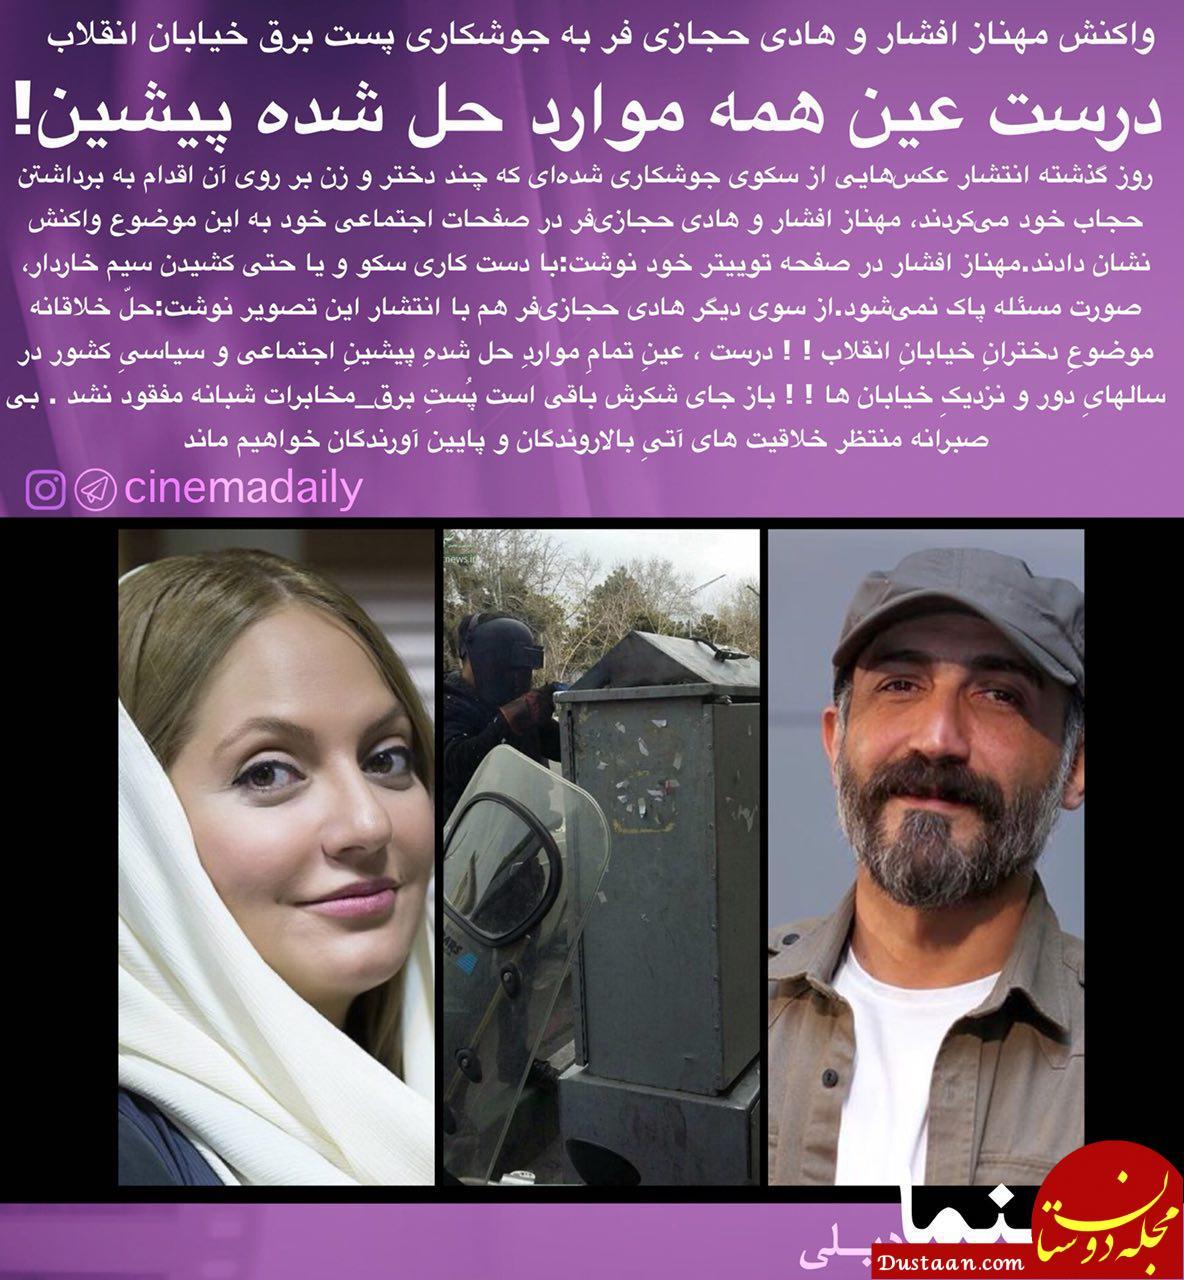 www.dustaan.com واکنش حجازی فر و مهناز افشار به جوشکاری پست برق پرحاشیه خیابان انقلاب +عکس